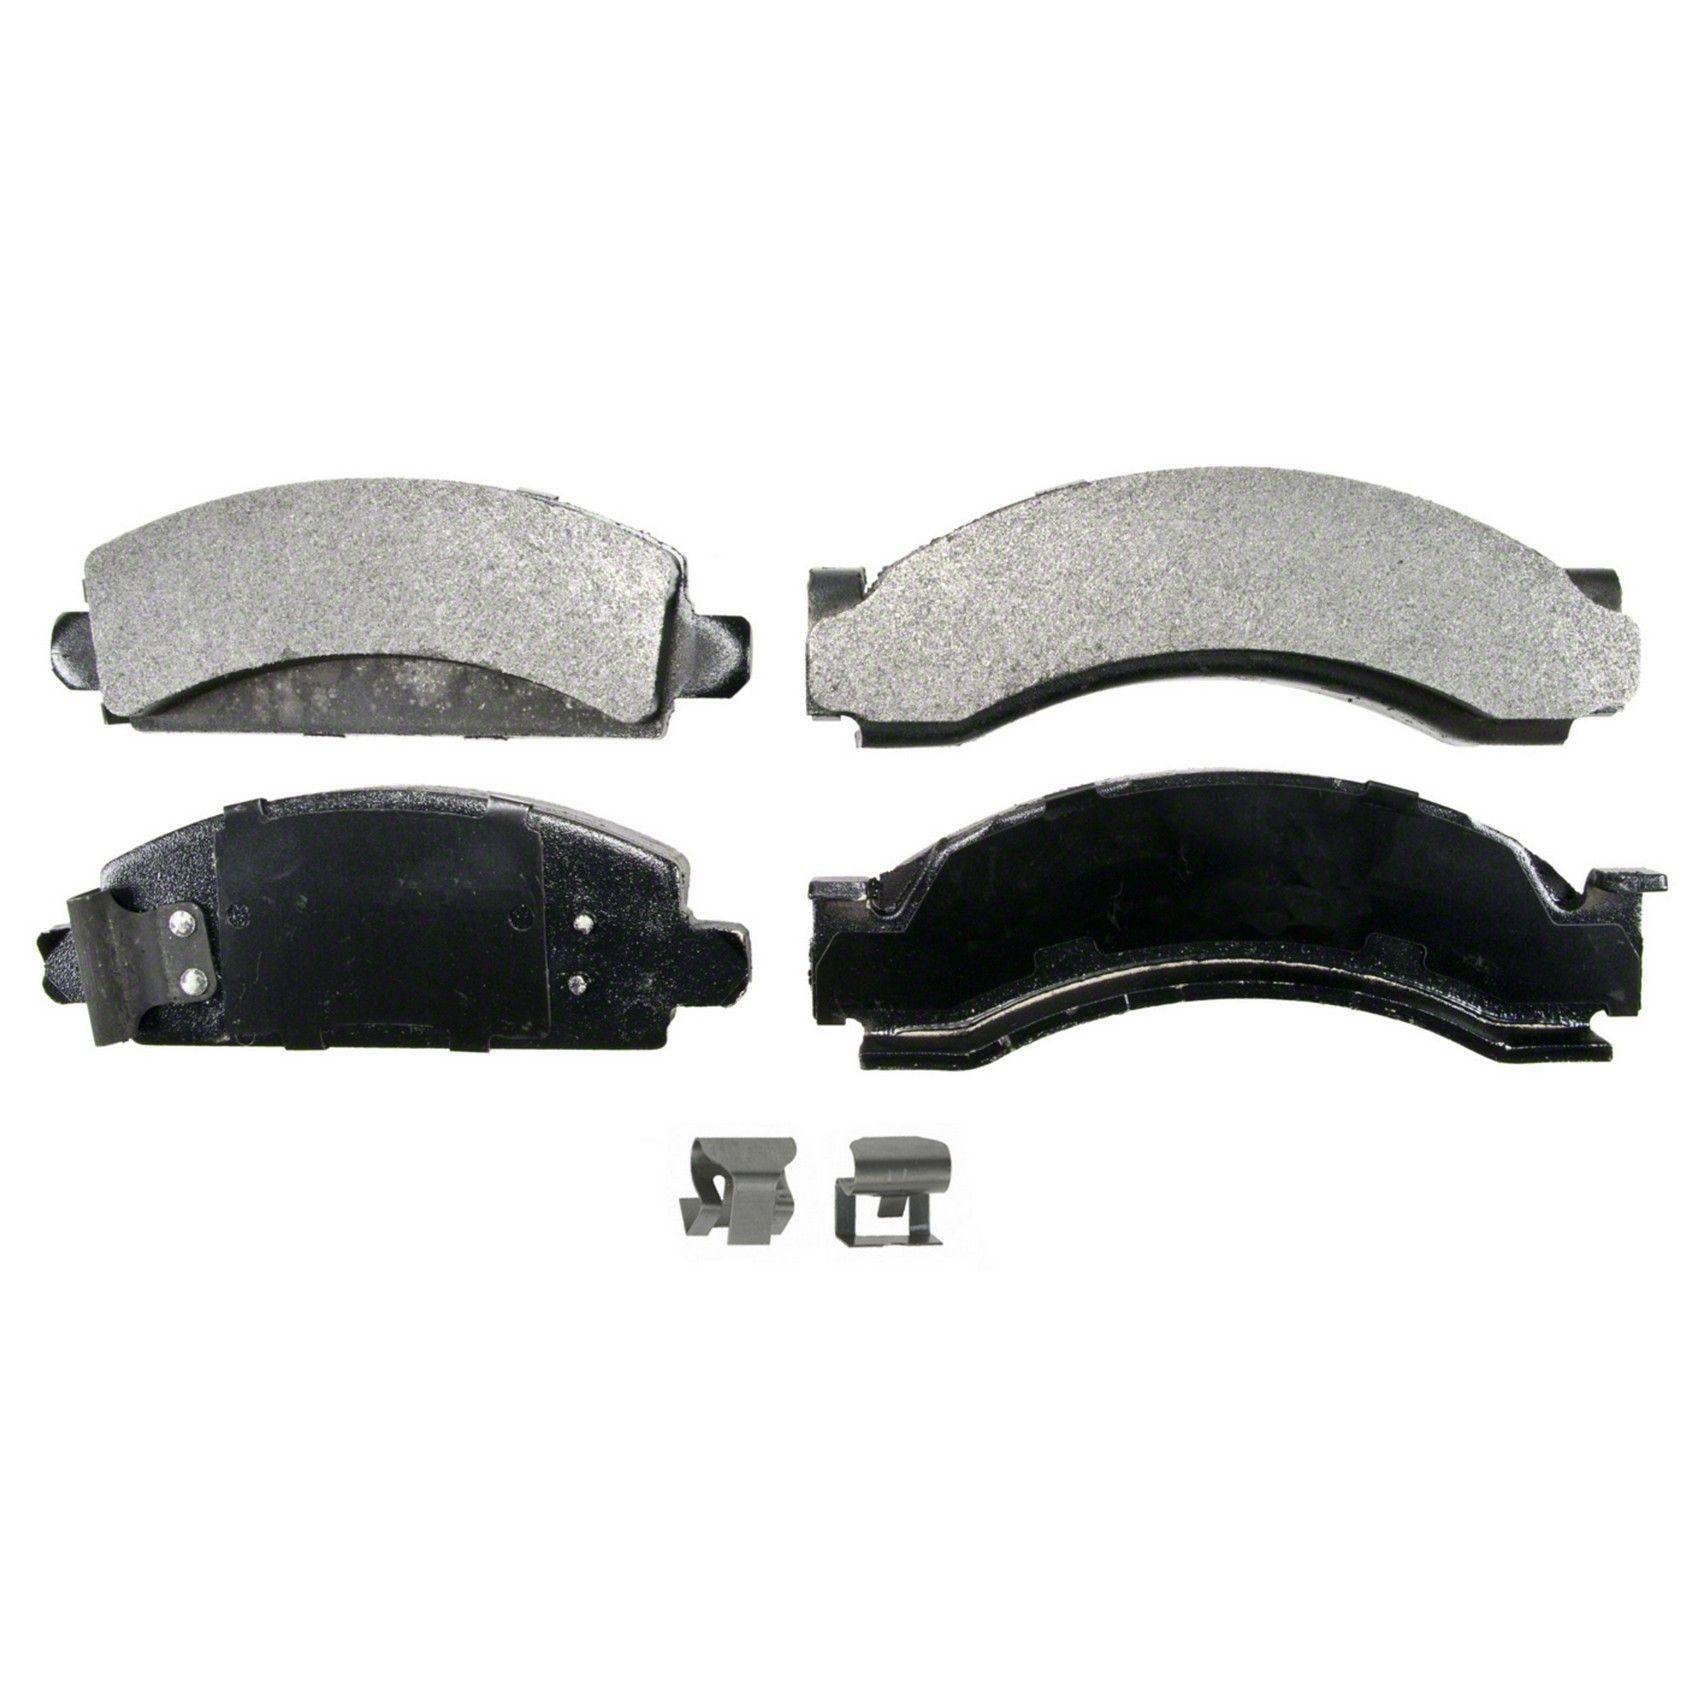 Chevrolet P30 Disc Brake Pad Replacement (Bendix, Bosch, Centric ...